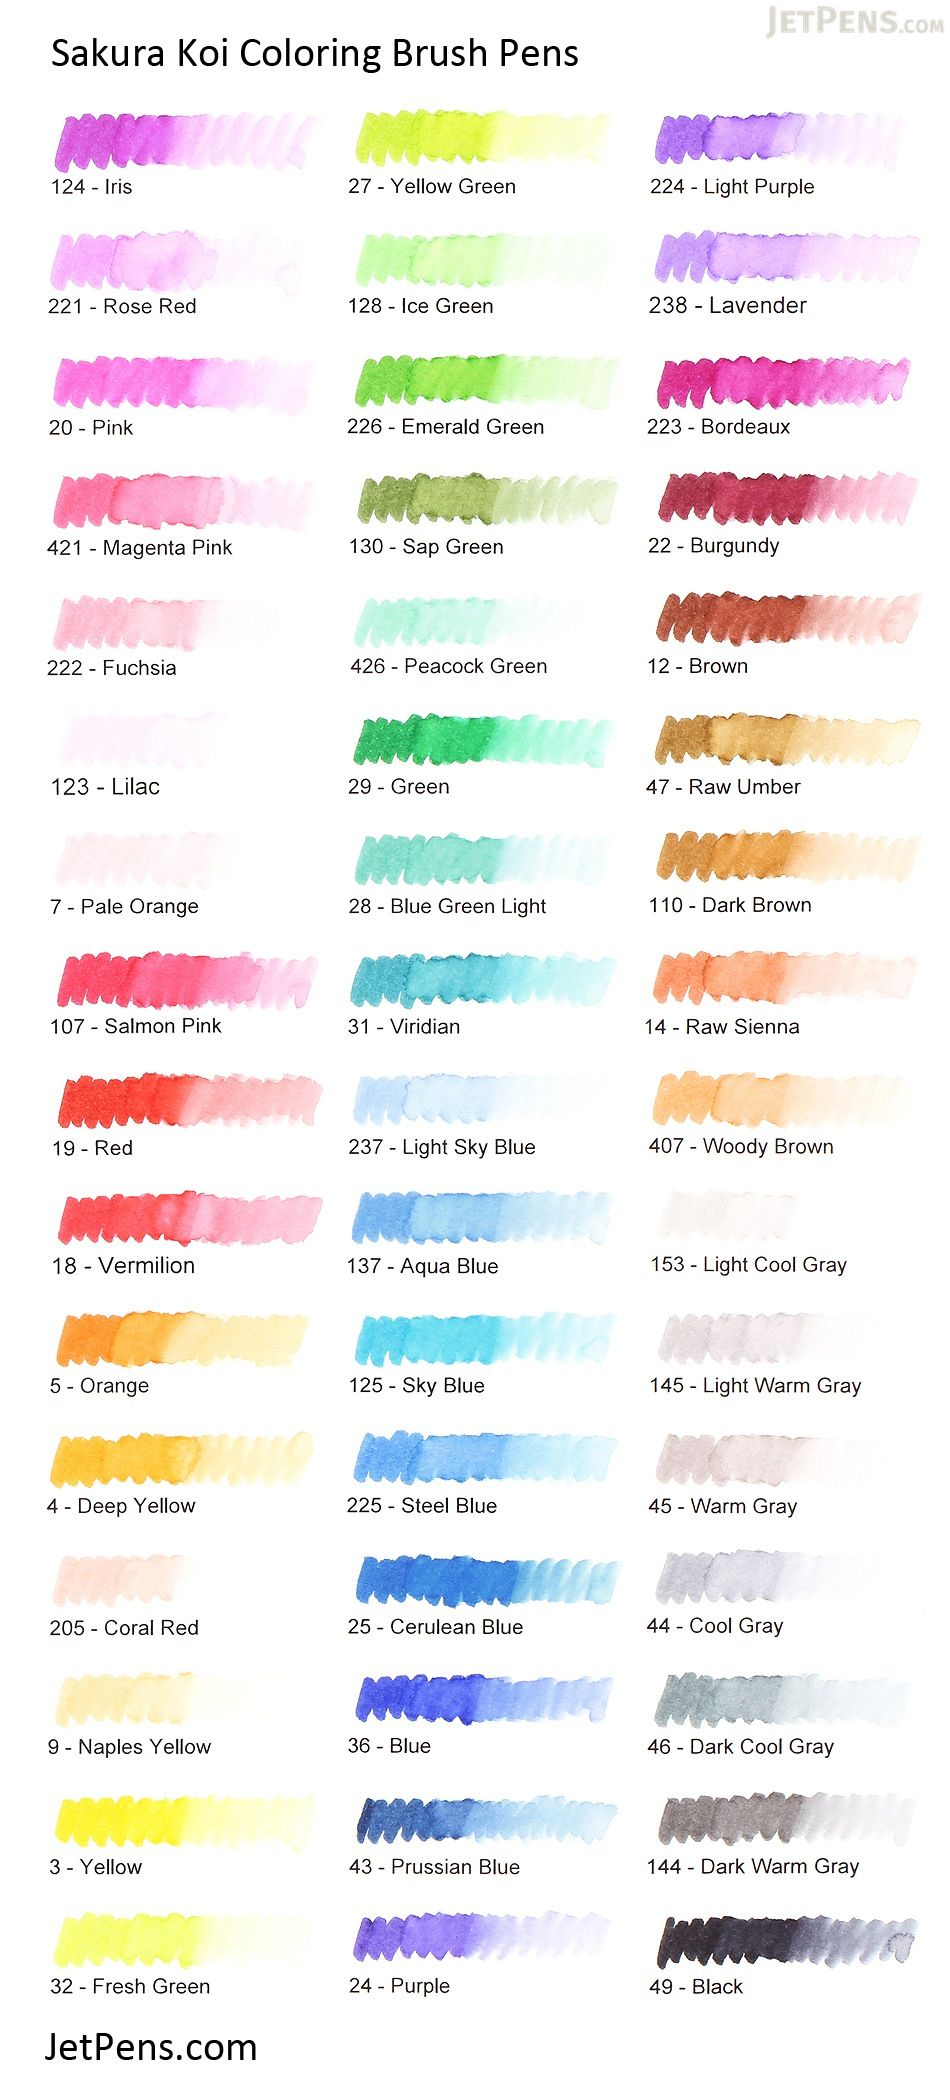 Sakura Koi Coloring Brush Pen - 12 Color Set - SAKURA XBR-12SA ...